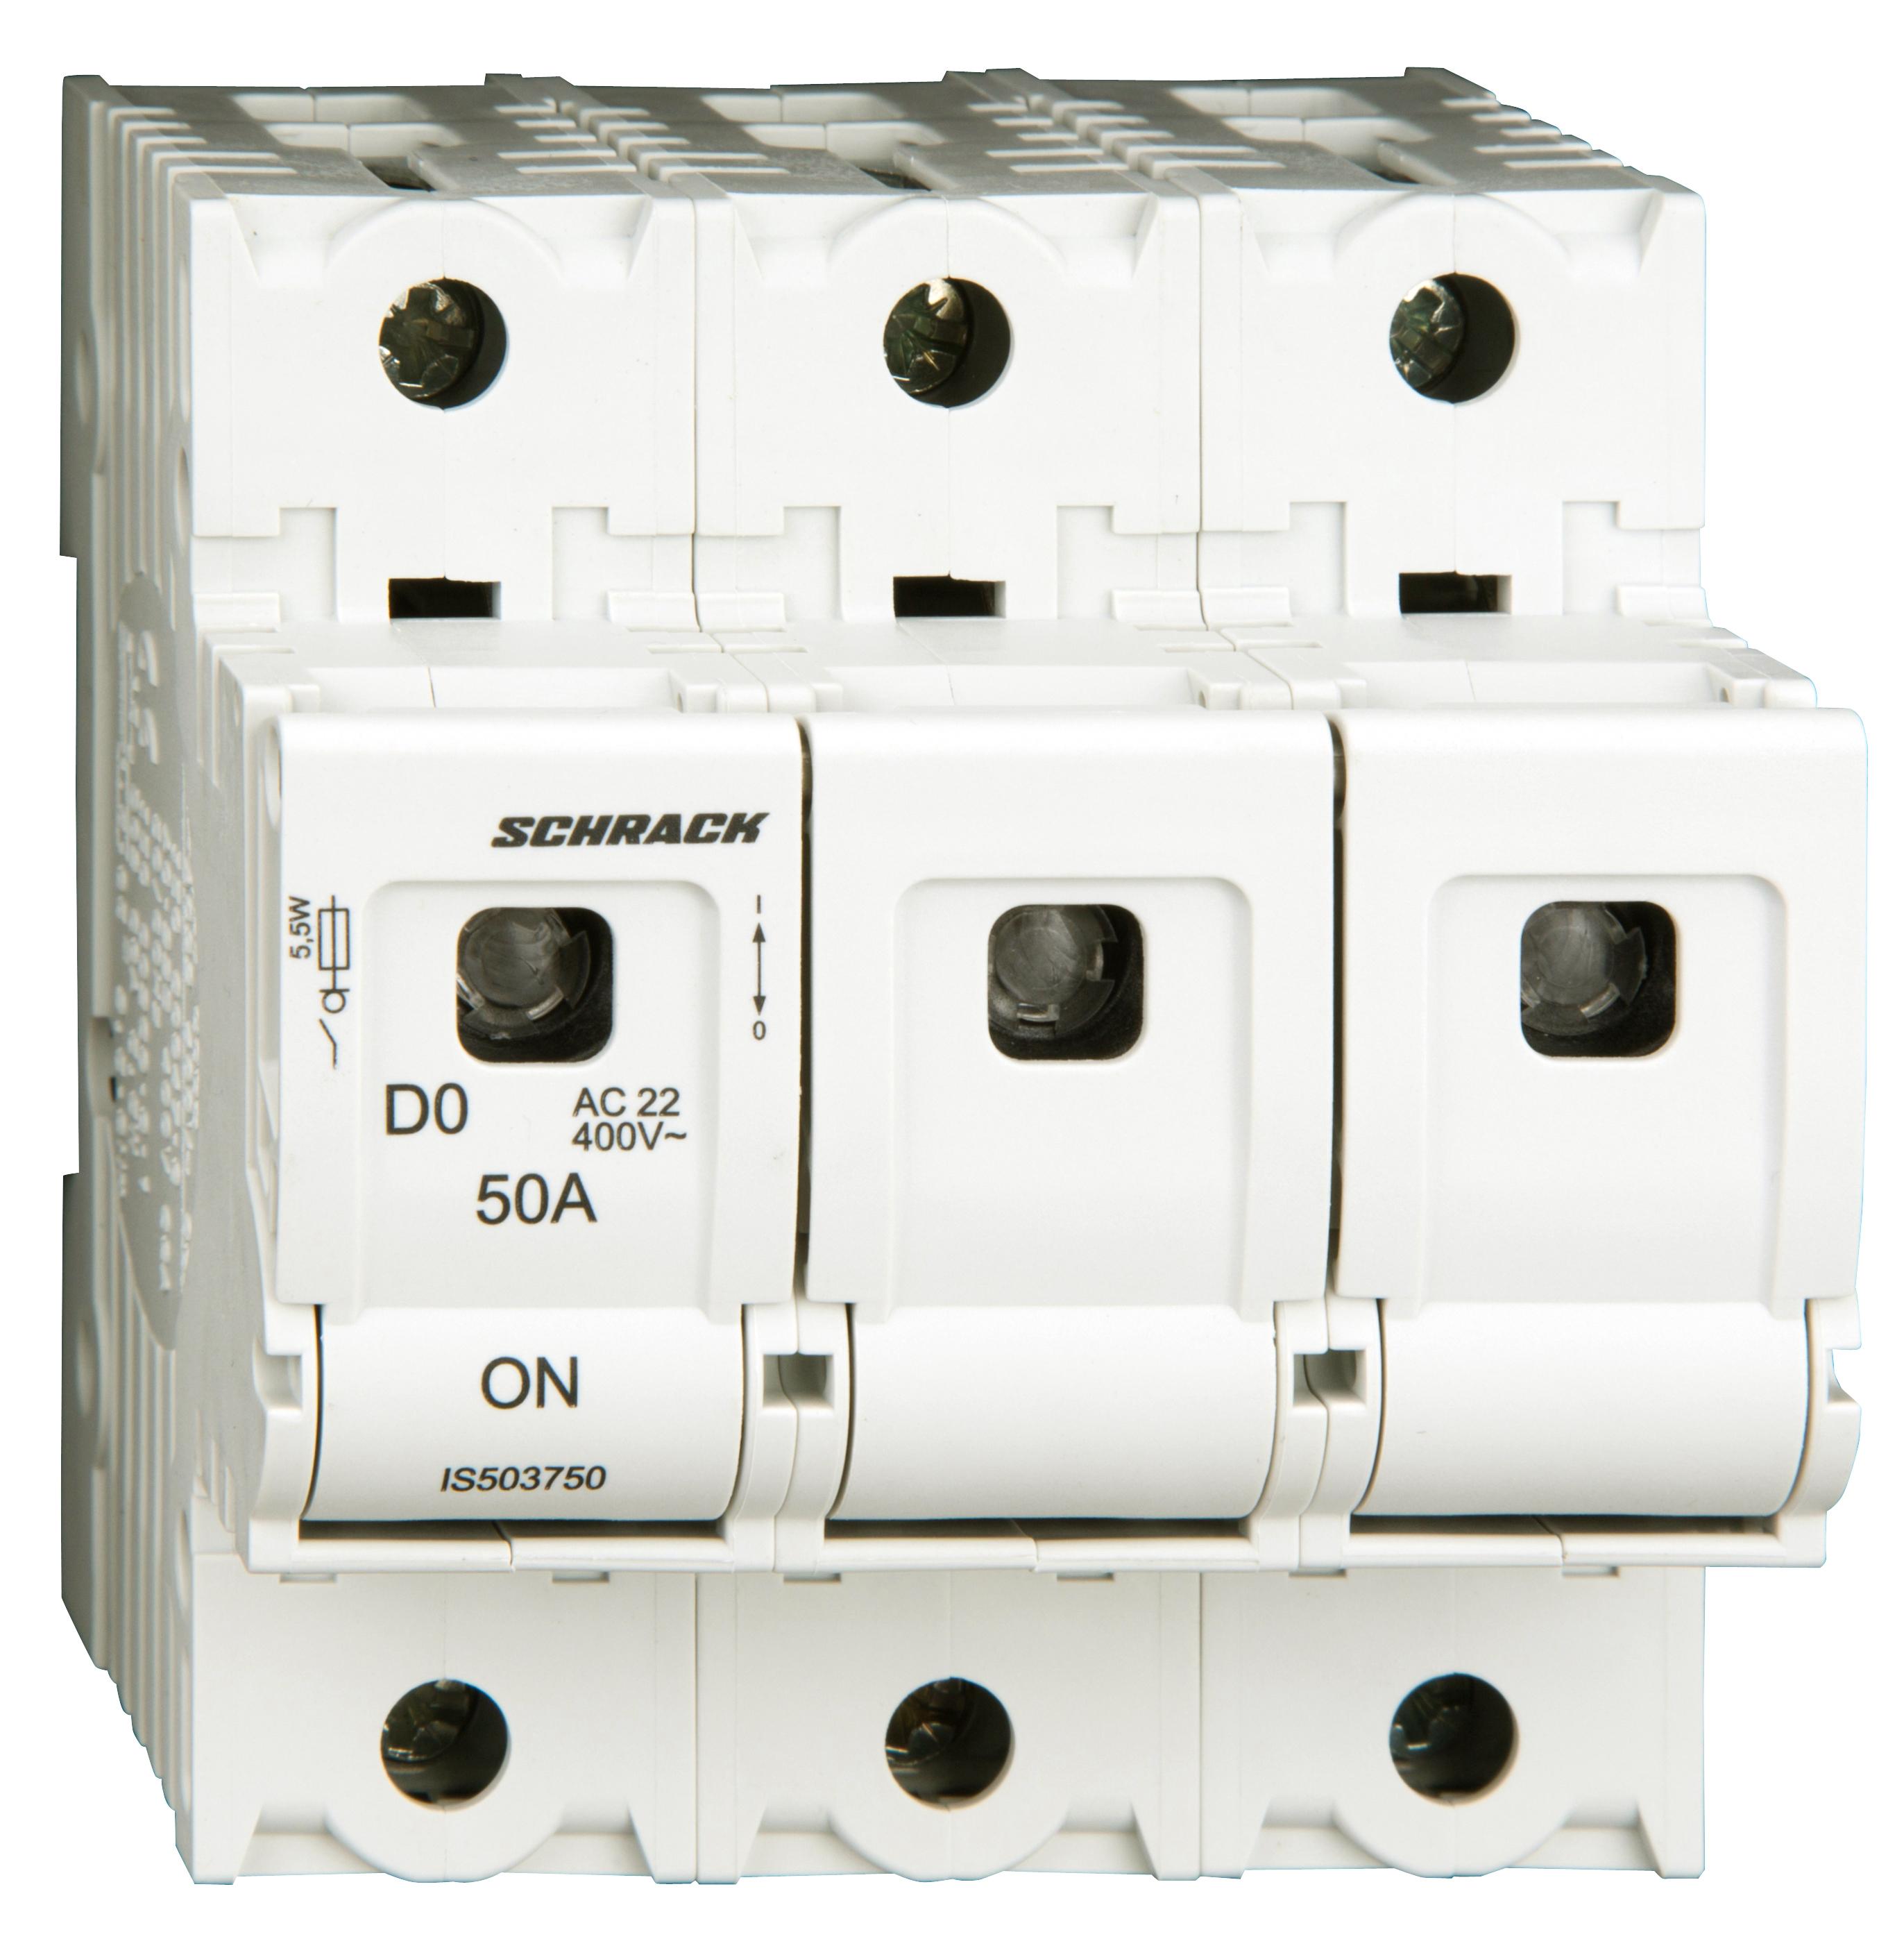 1 Stk D02-Lasttrennschalter ARROW S, 3-polig, 50A IS503750--